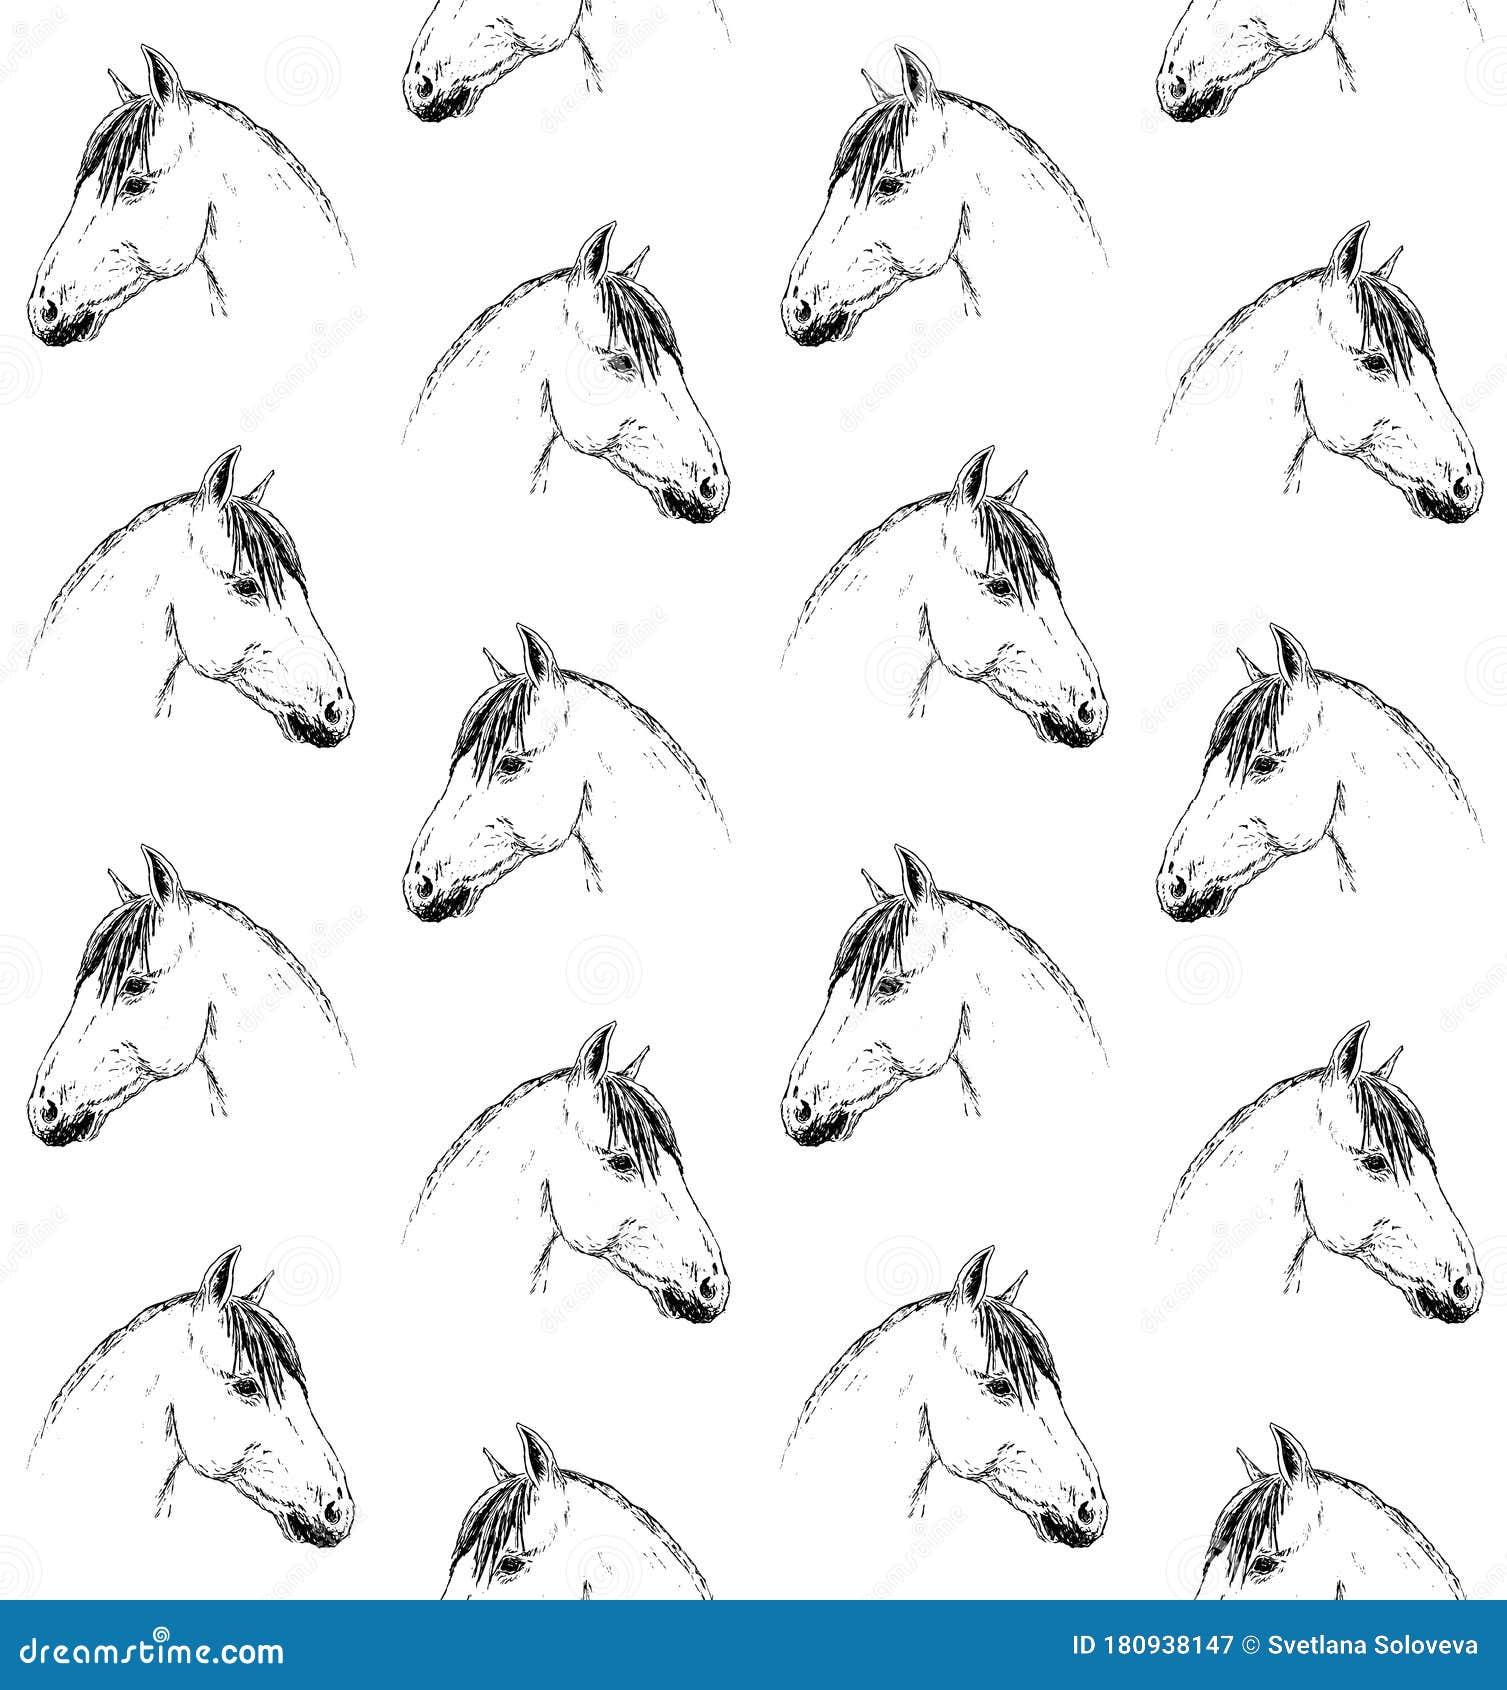 Vector Seamless Pattern Of Sketch Horse Head Stock Illustration Illustration Of Cute Decor 180938147